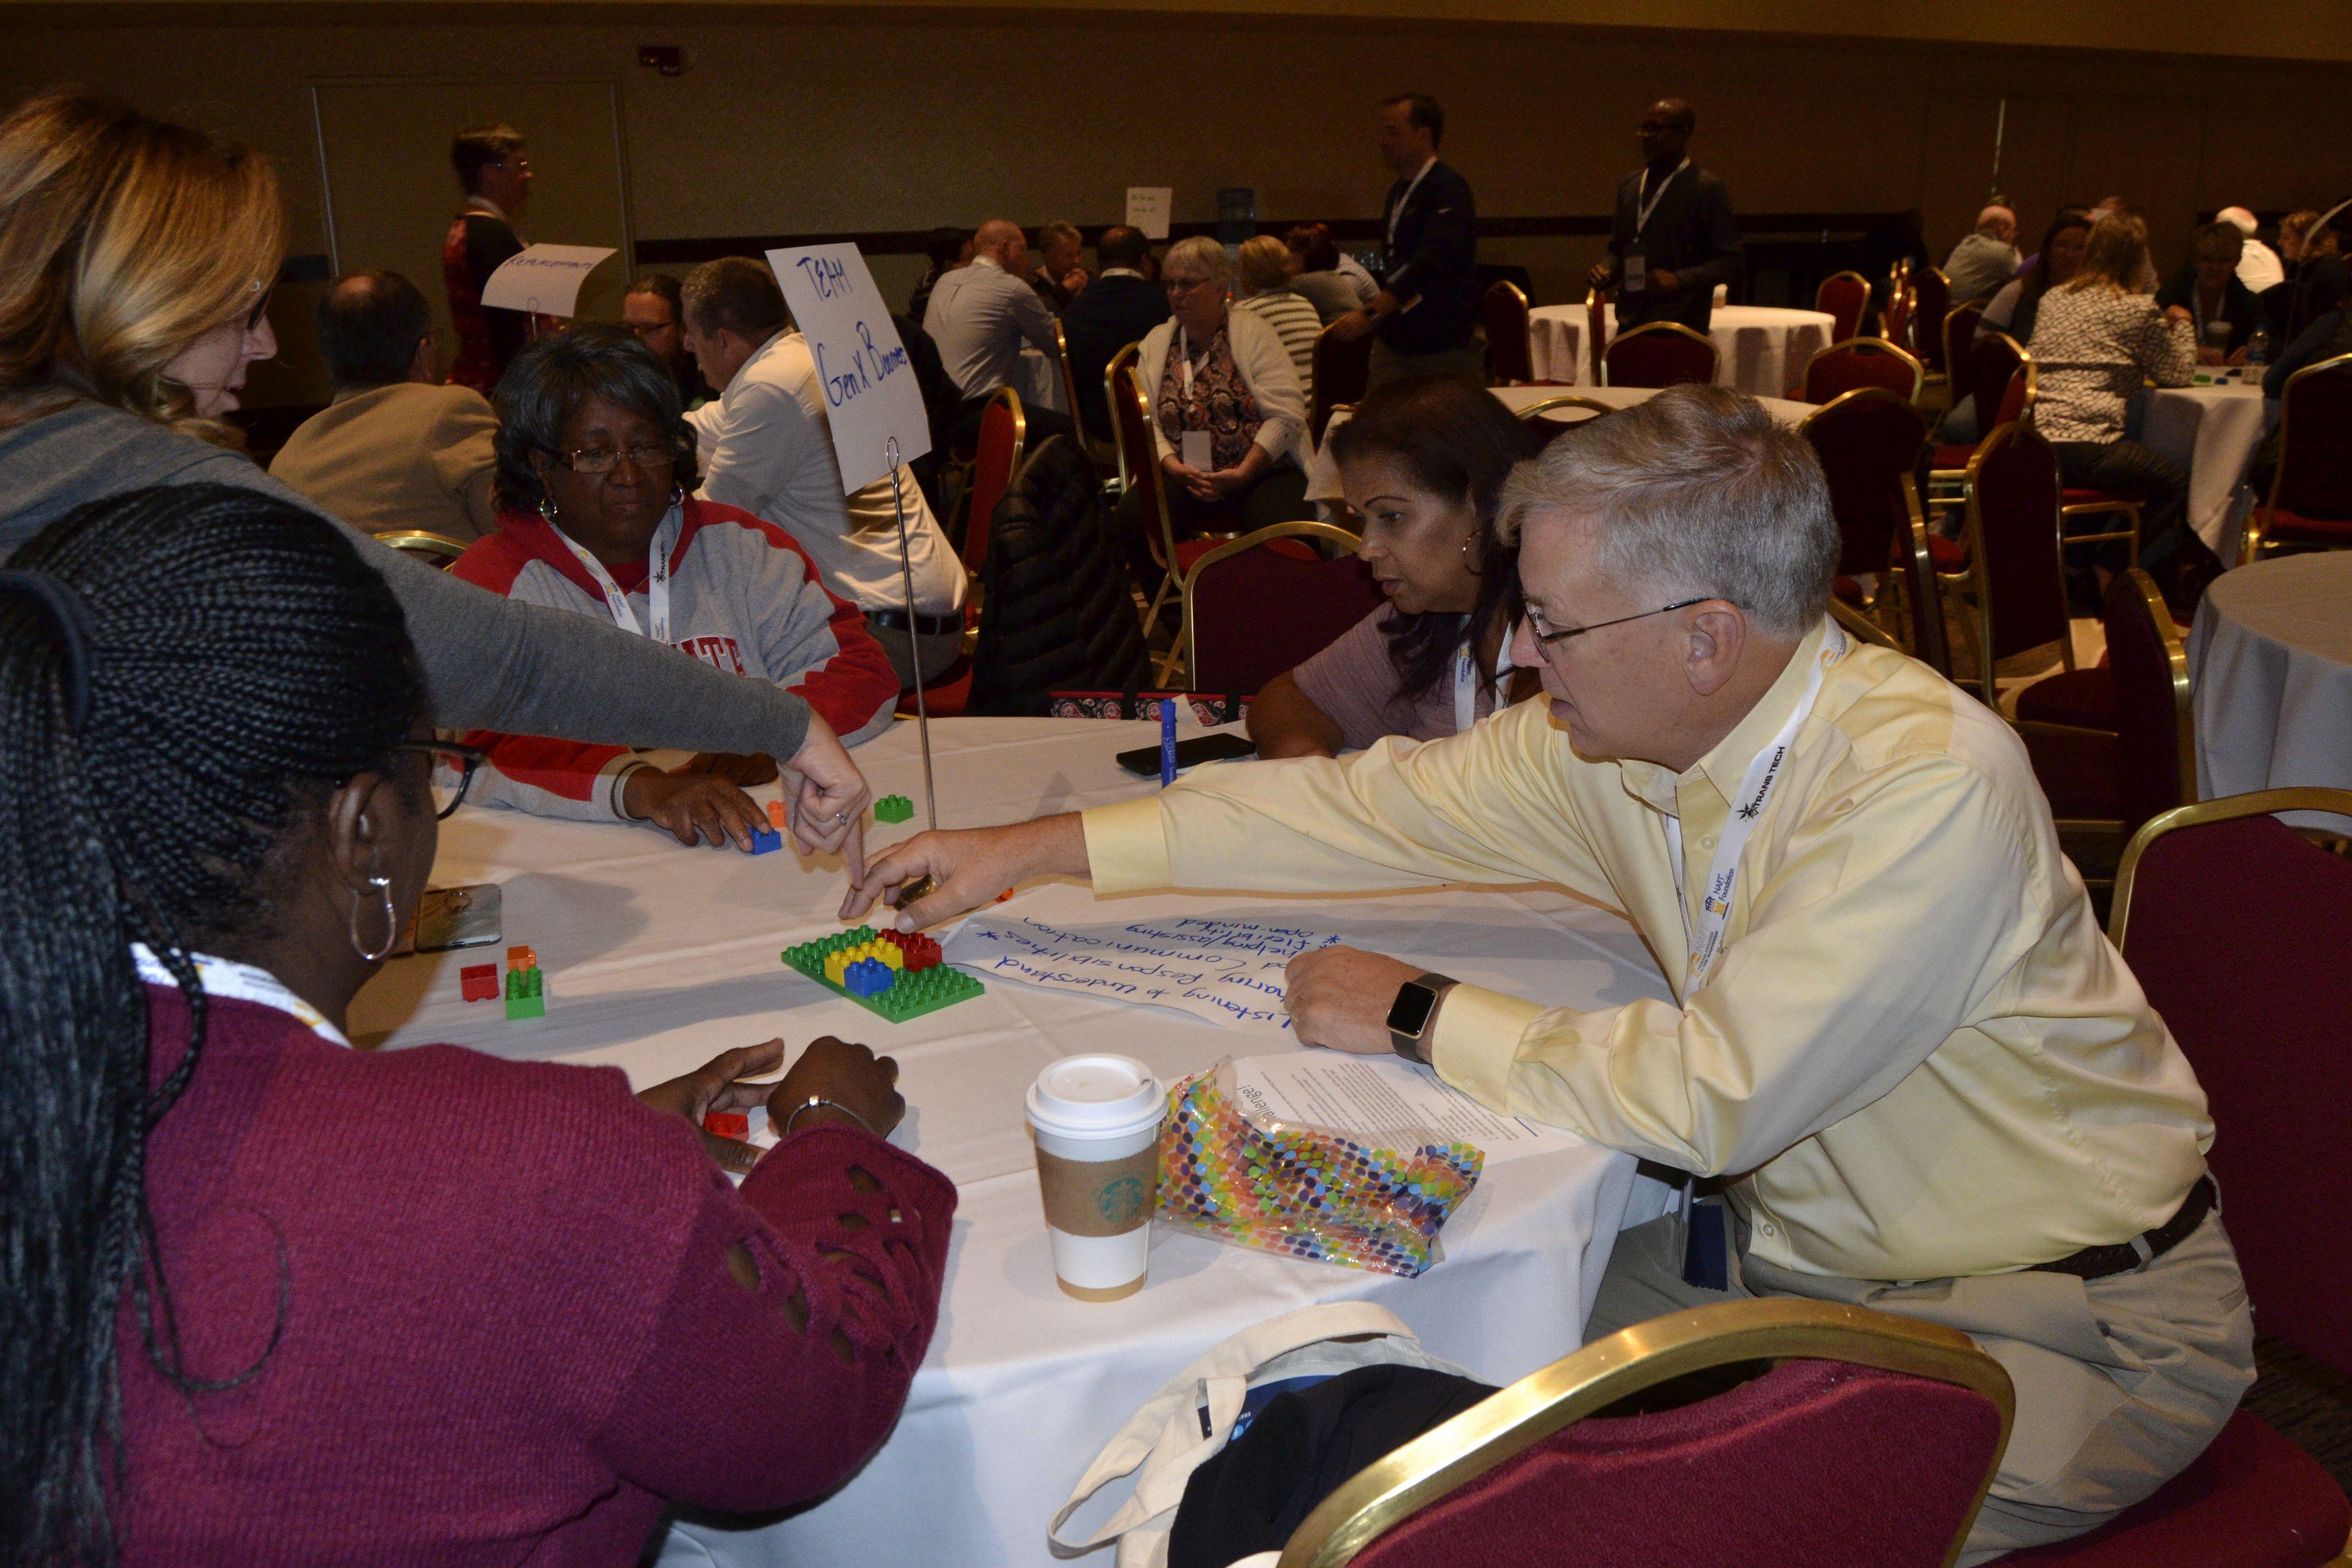 NAPT Conference Spotlights Teamwork, Inclusiveness